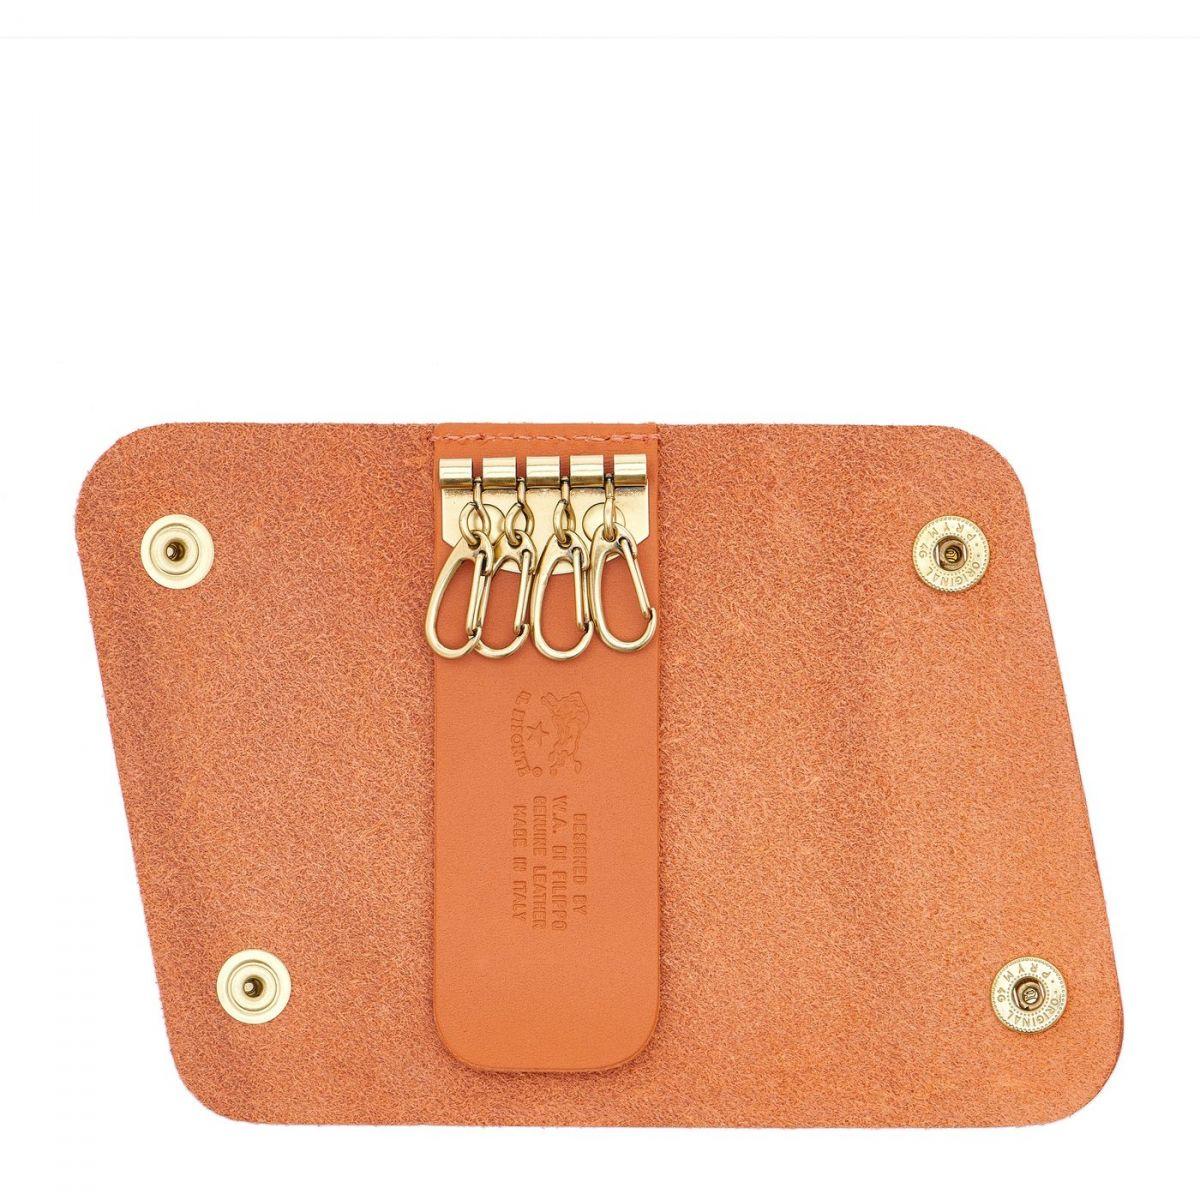 Keyring in Cowhide Double Leather color Orange - SKH026 | Details